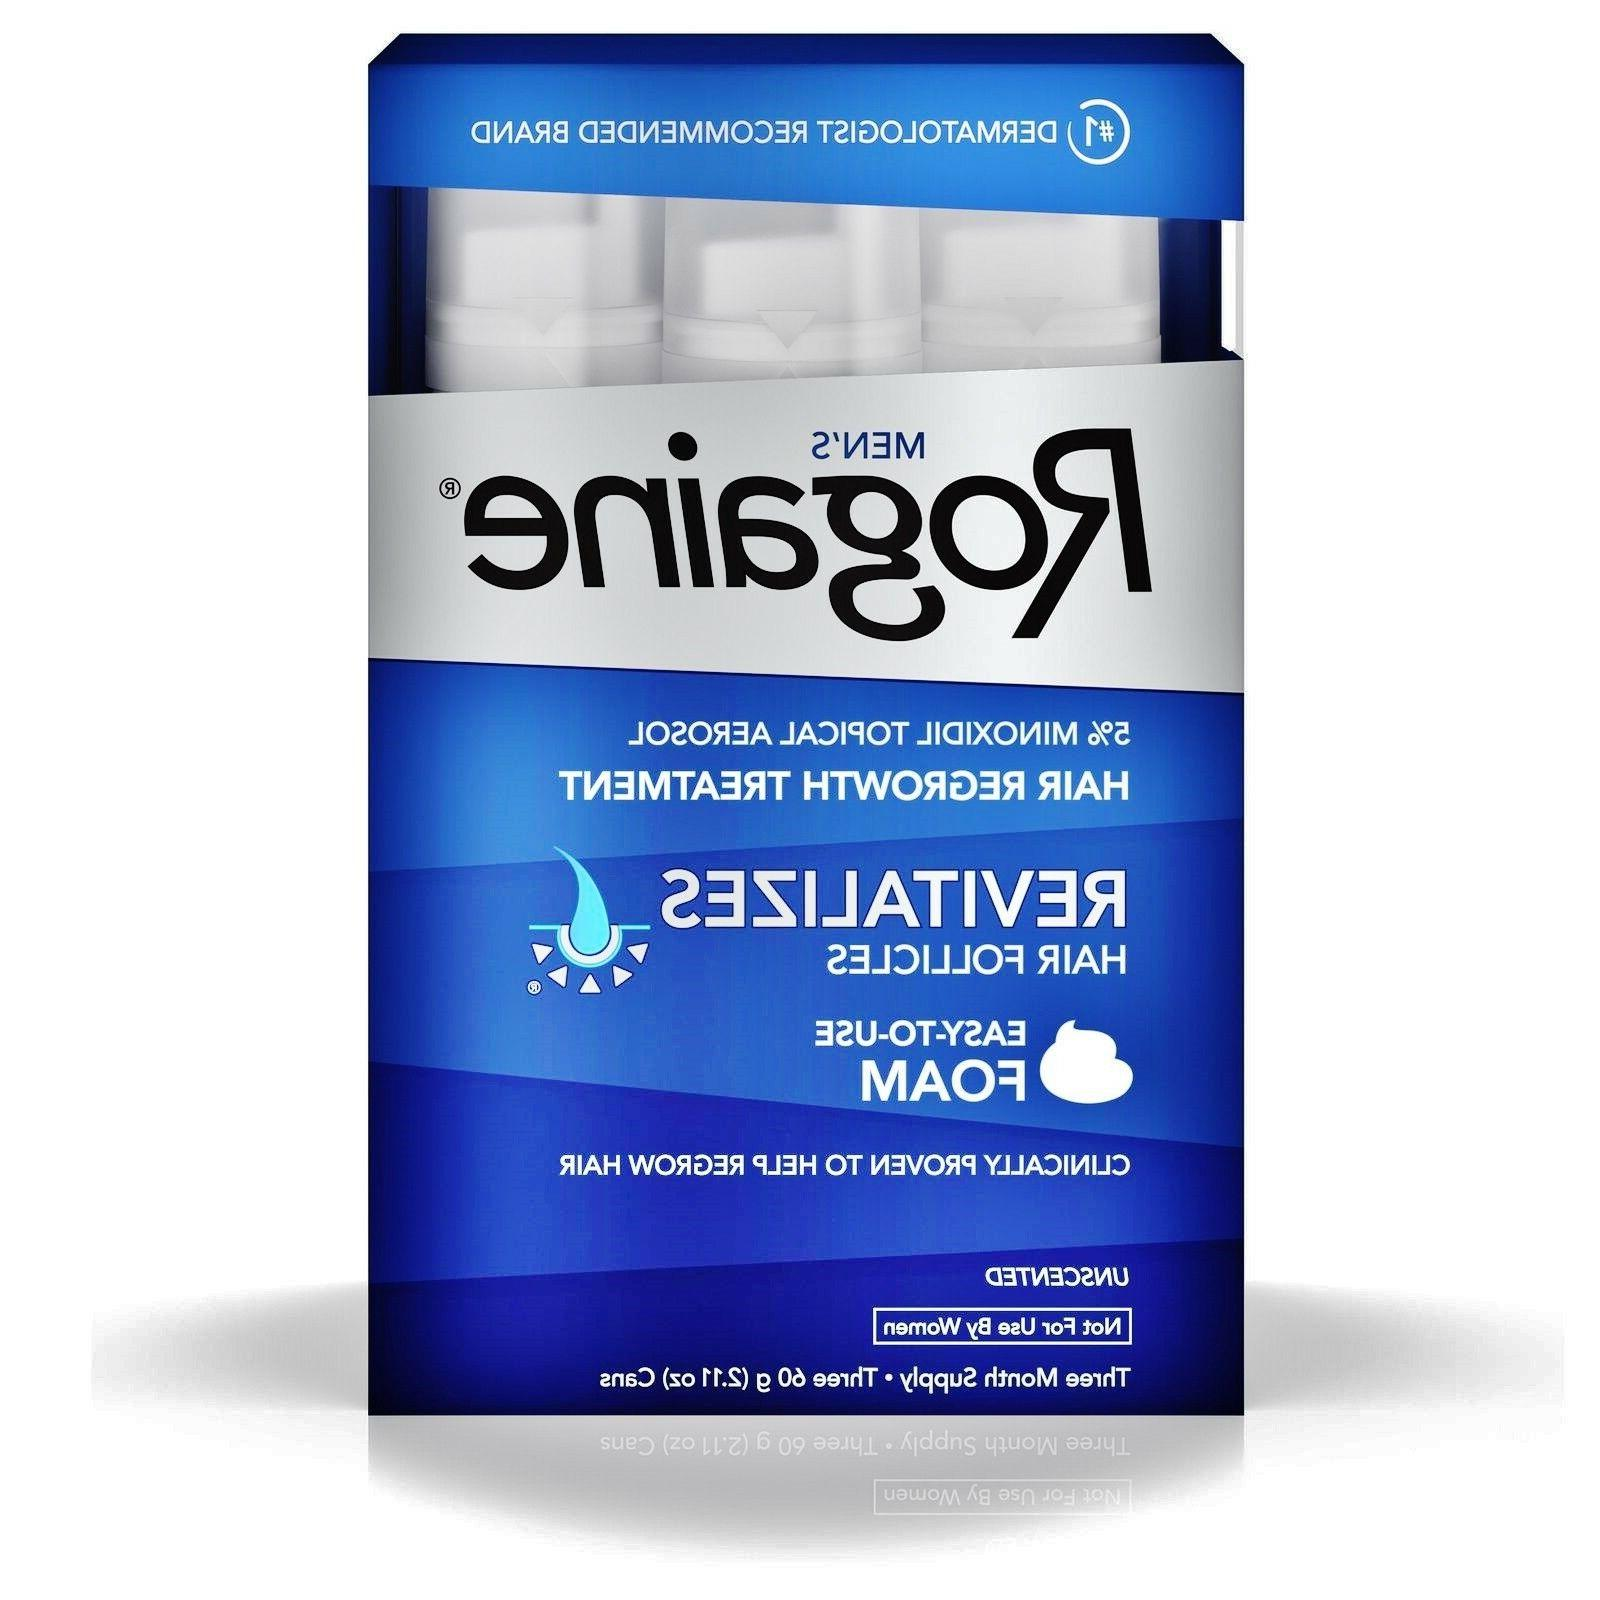 Men's Rogaine Hair Regrowth Treatment, 5% Minoxidil Topical